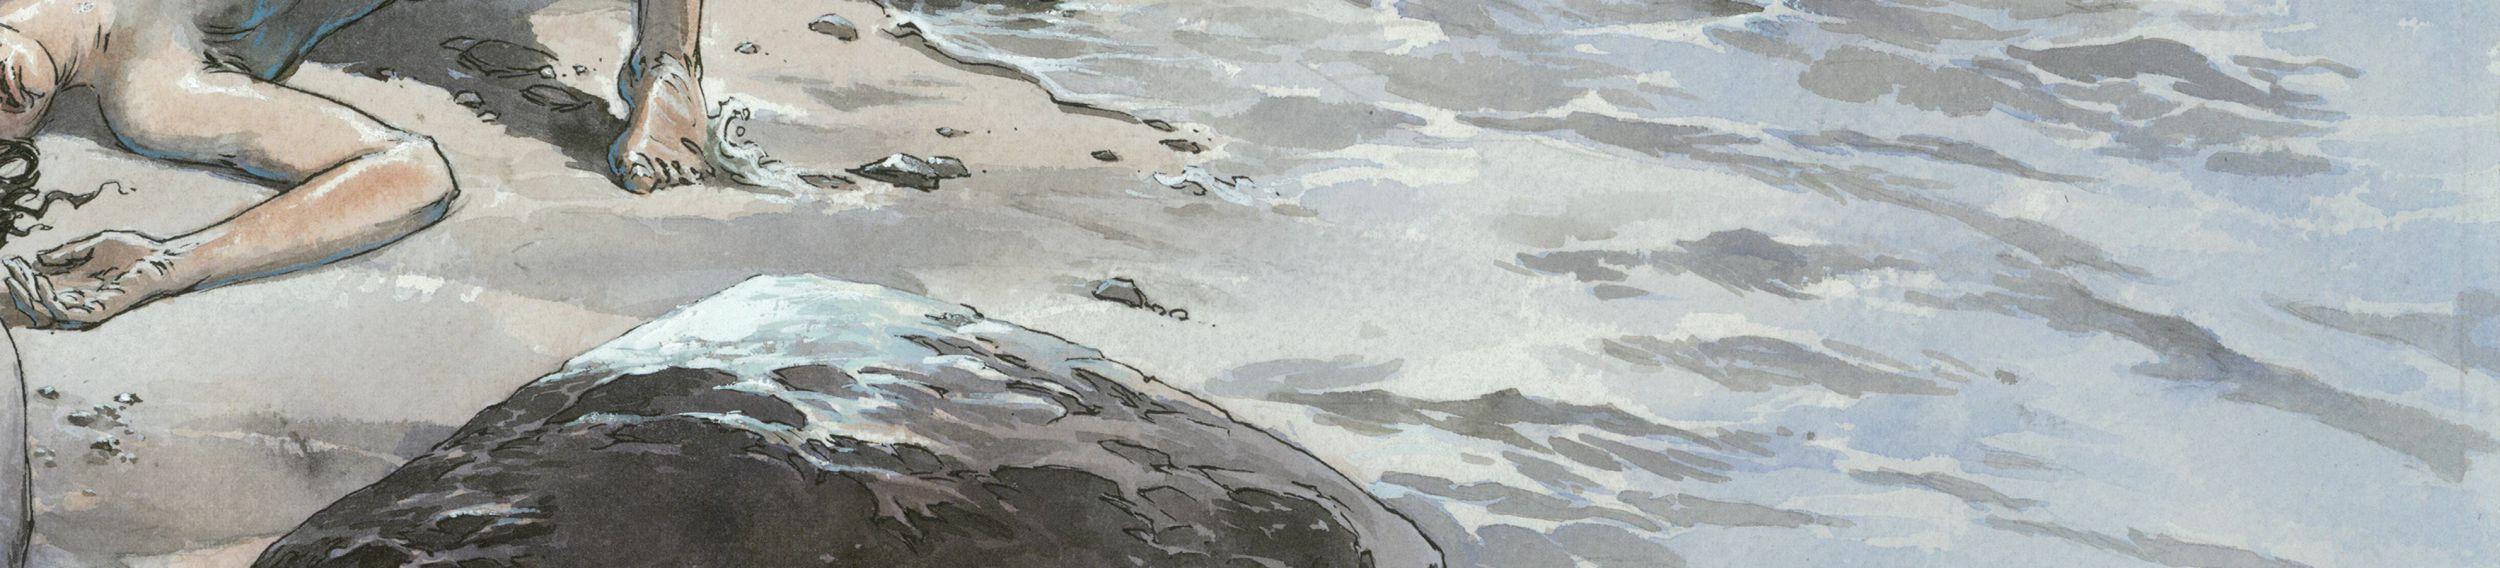 Sur la plage © Sorel